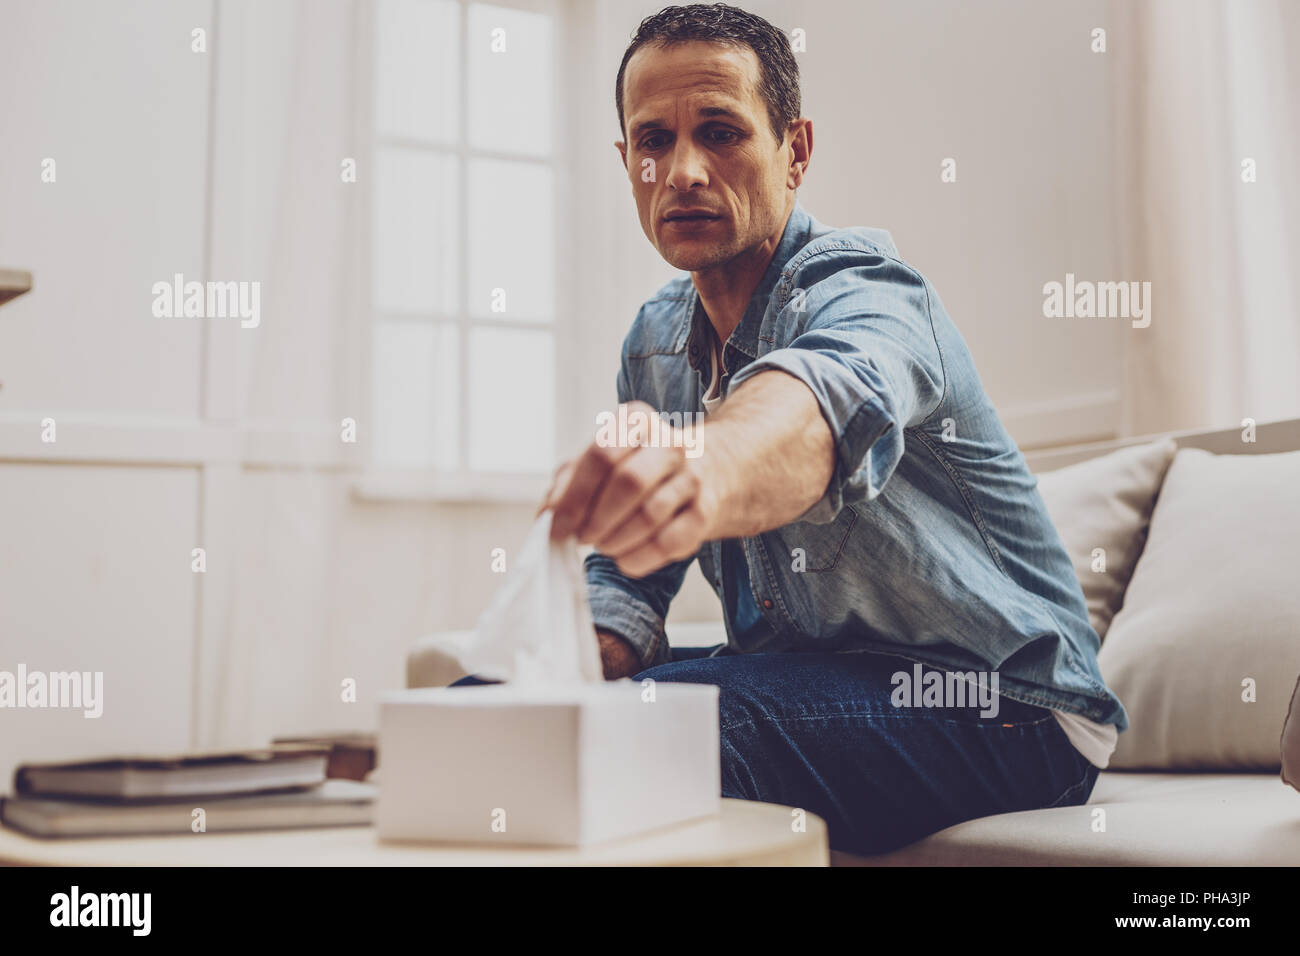 Crying upset man looking forwards - Stock Image